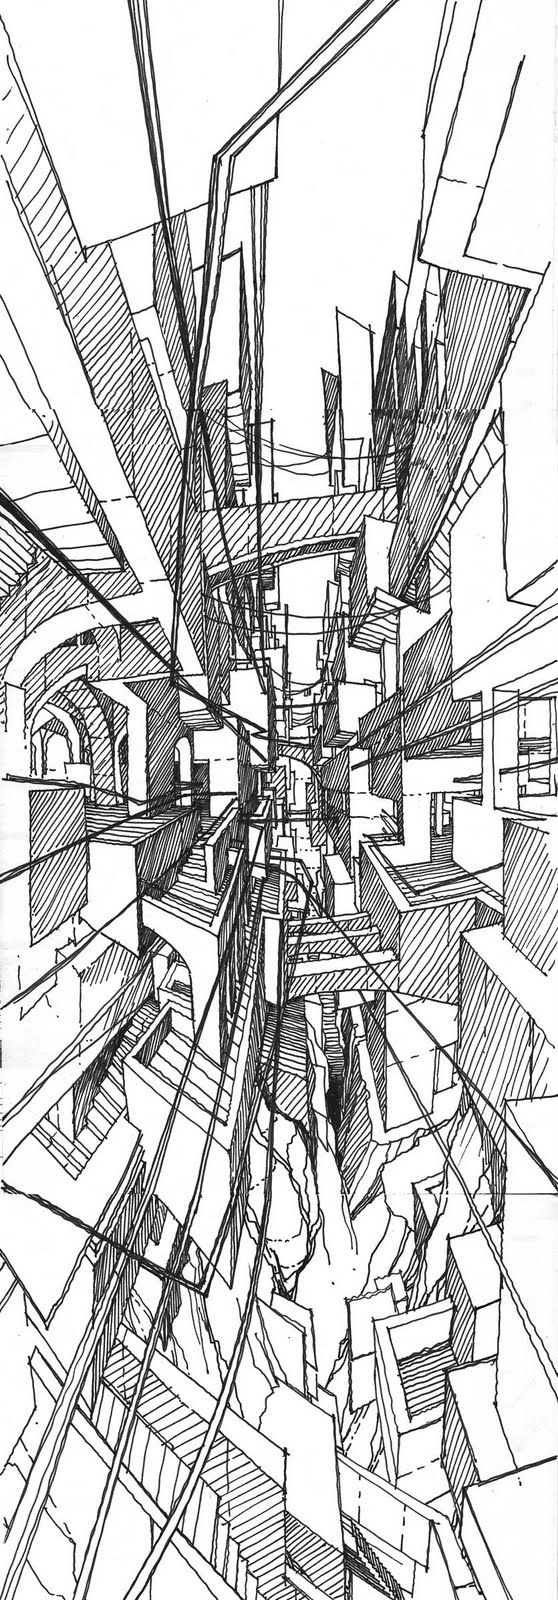 IMAGINARY JERUSALEM / Drawing by Stefan Davidovici, Architect - Milan, Italy | the architecture draftsman